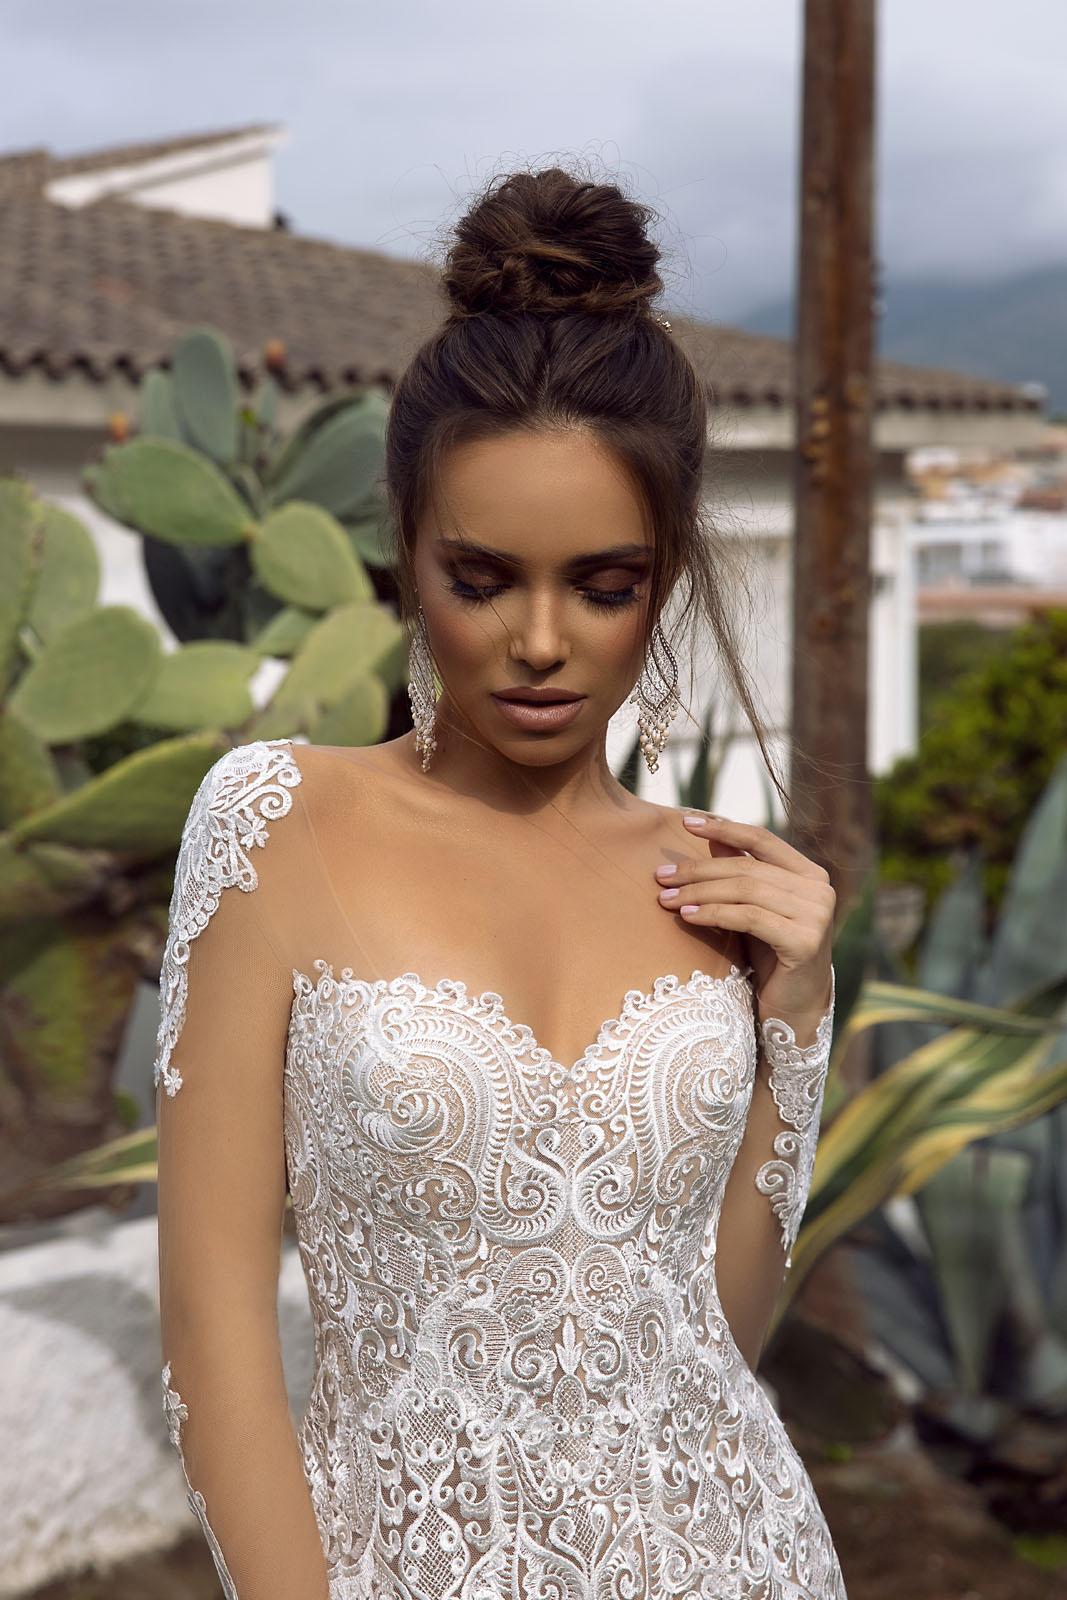 PAMELA-Passion by Tina-Tina Valerdi - Kolekcja 2020